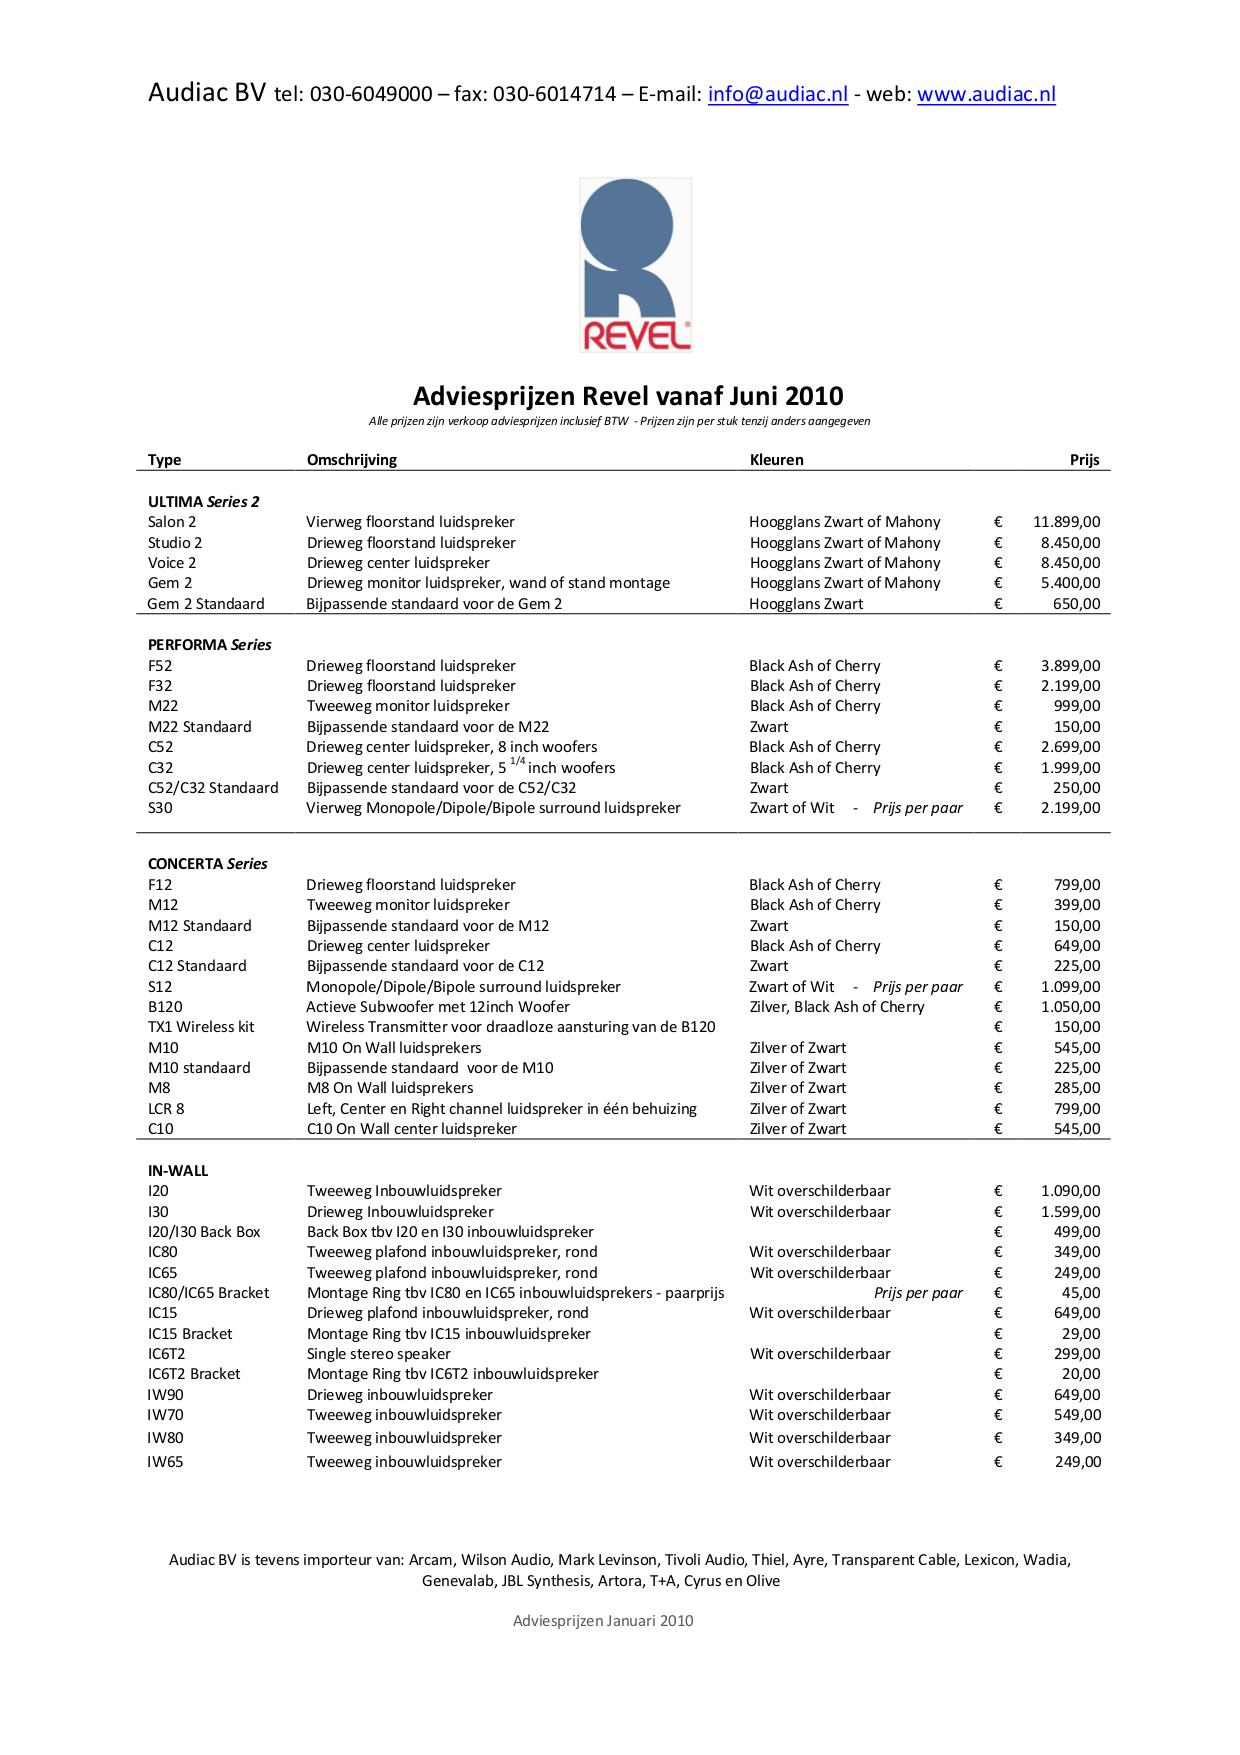 pdf for Revel Speaker Concerta IC80 manual